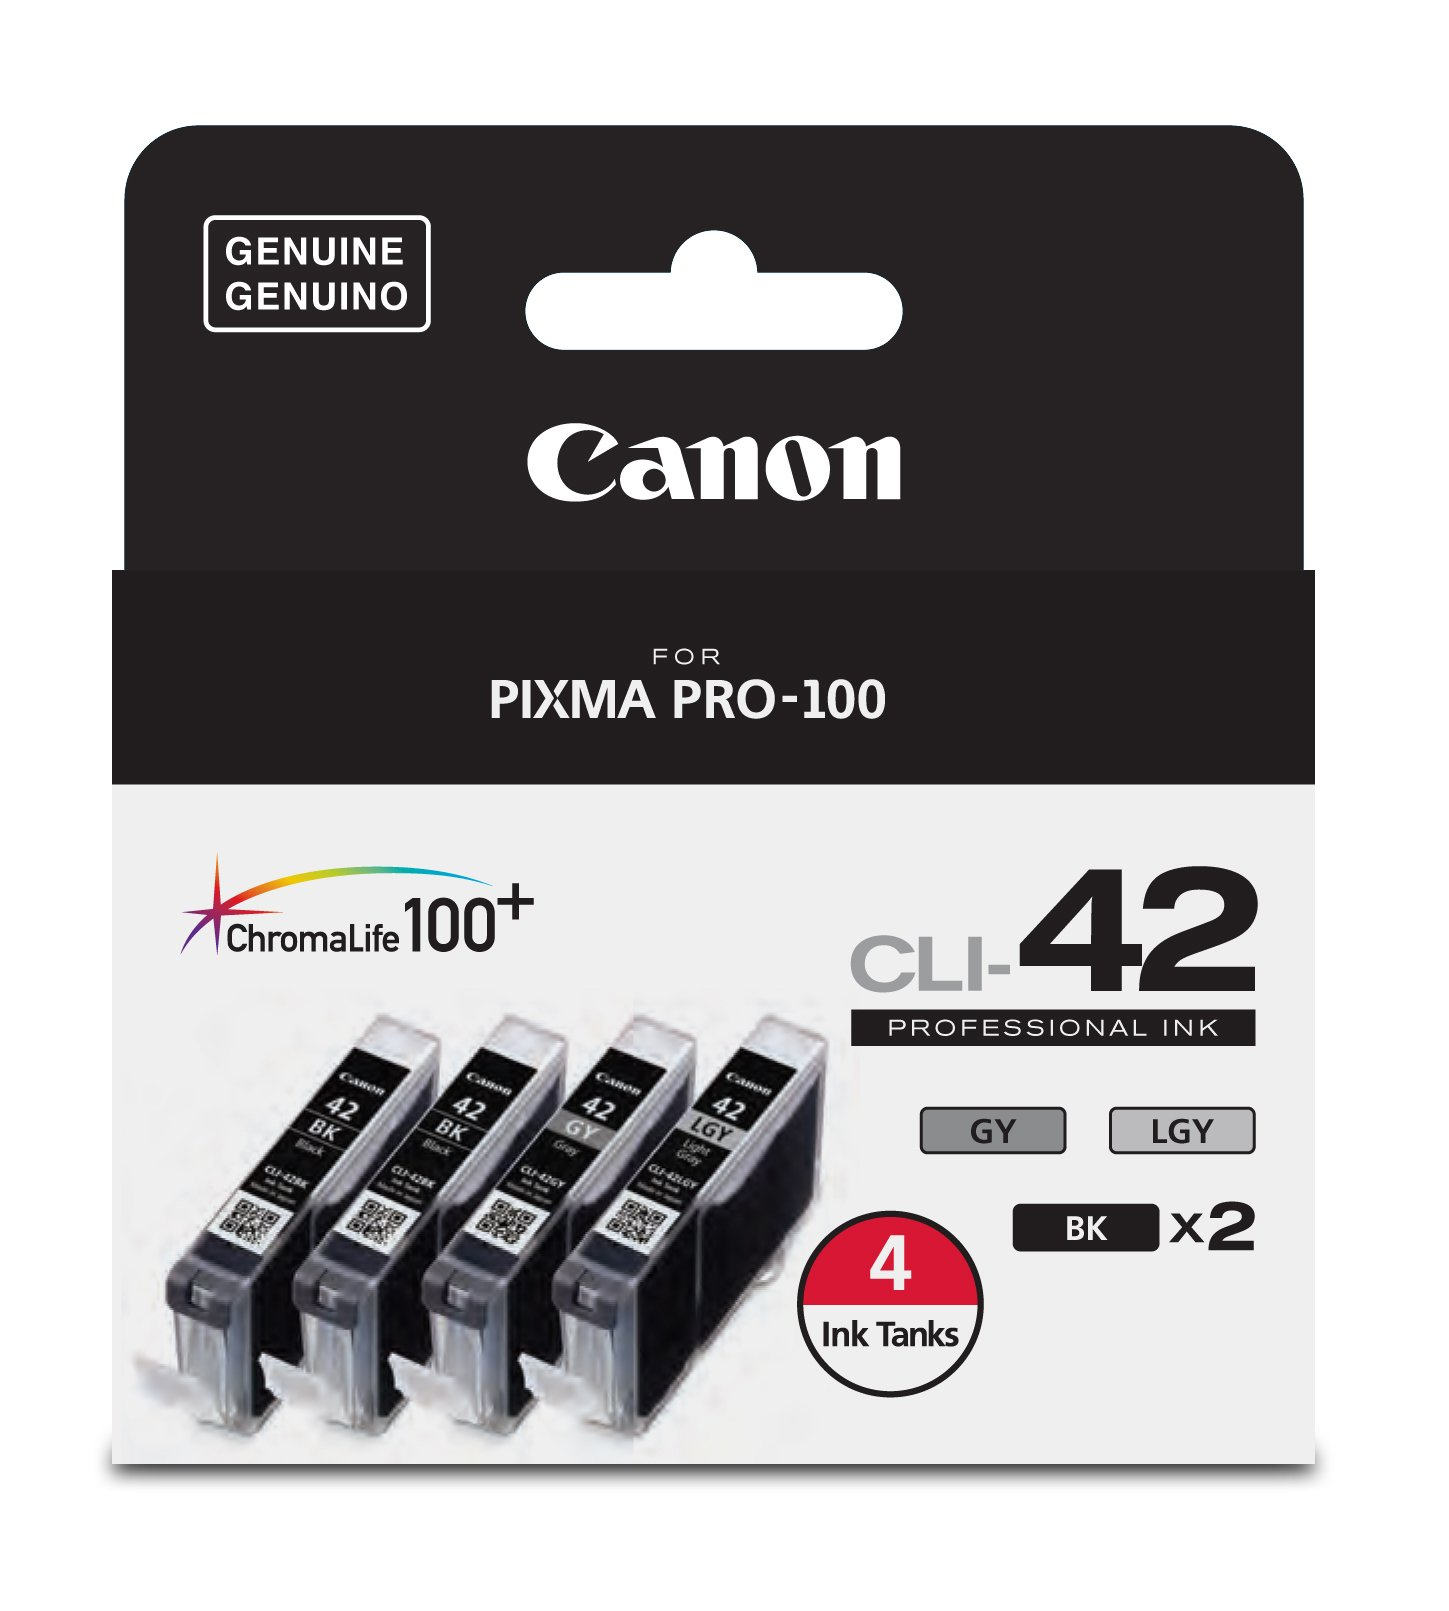 Canon CLI-42 ChromaLife Value Pack (2 Photo Black, 1 Gray & 1 Light Gray) for Pixma Pro-100